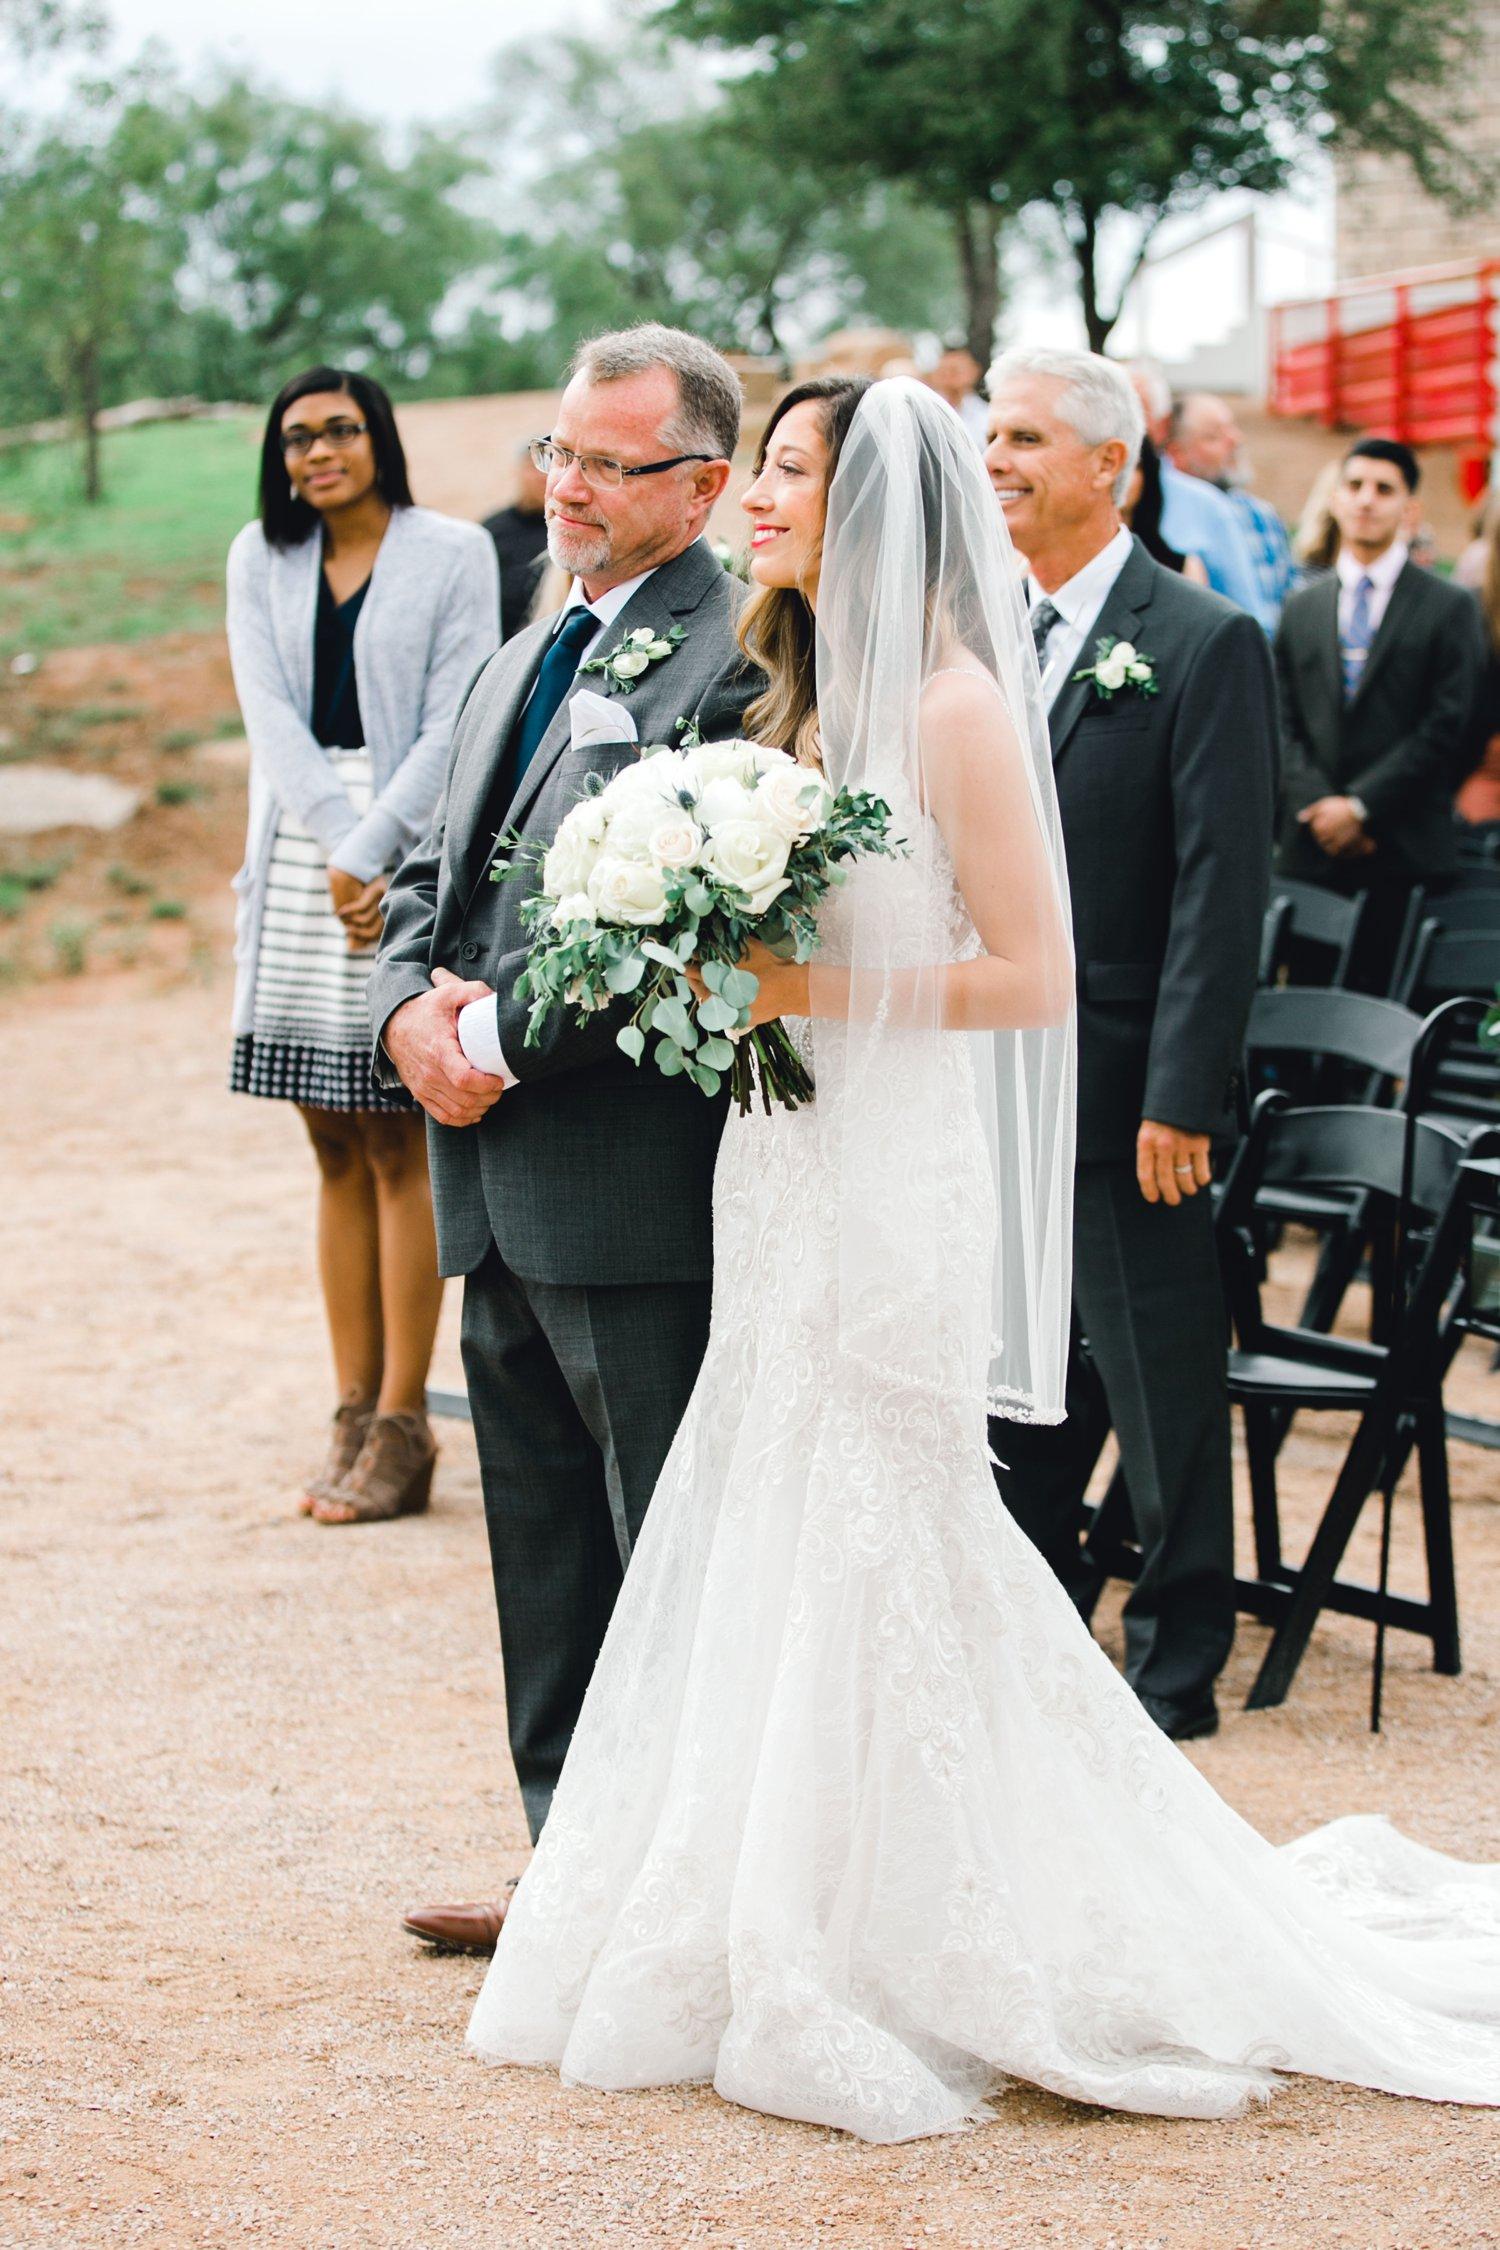 Ashley_John_English_Elegant_Texas_Wedding_Outdoors_Ranch_Caprock_Winery_ALLEEJ_0112.jpg